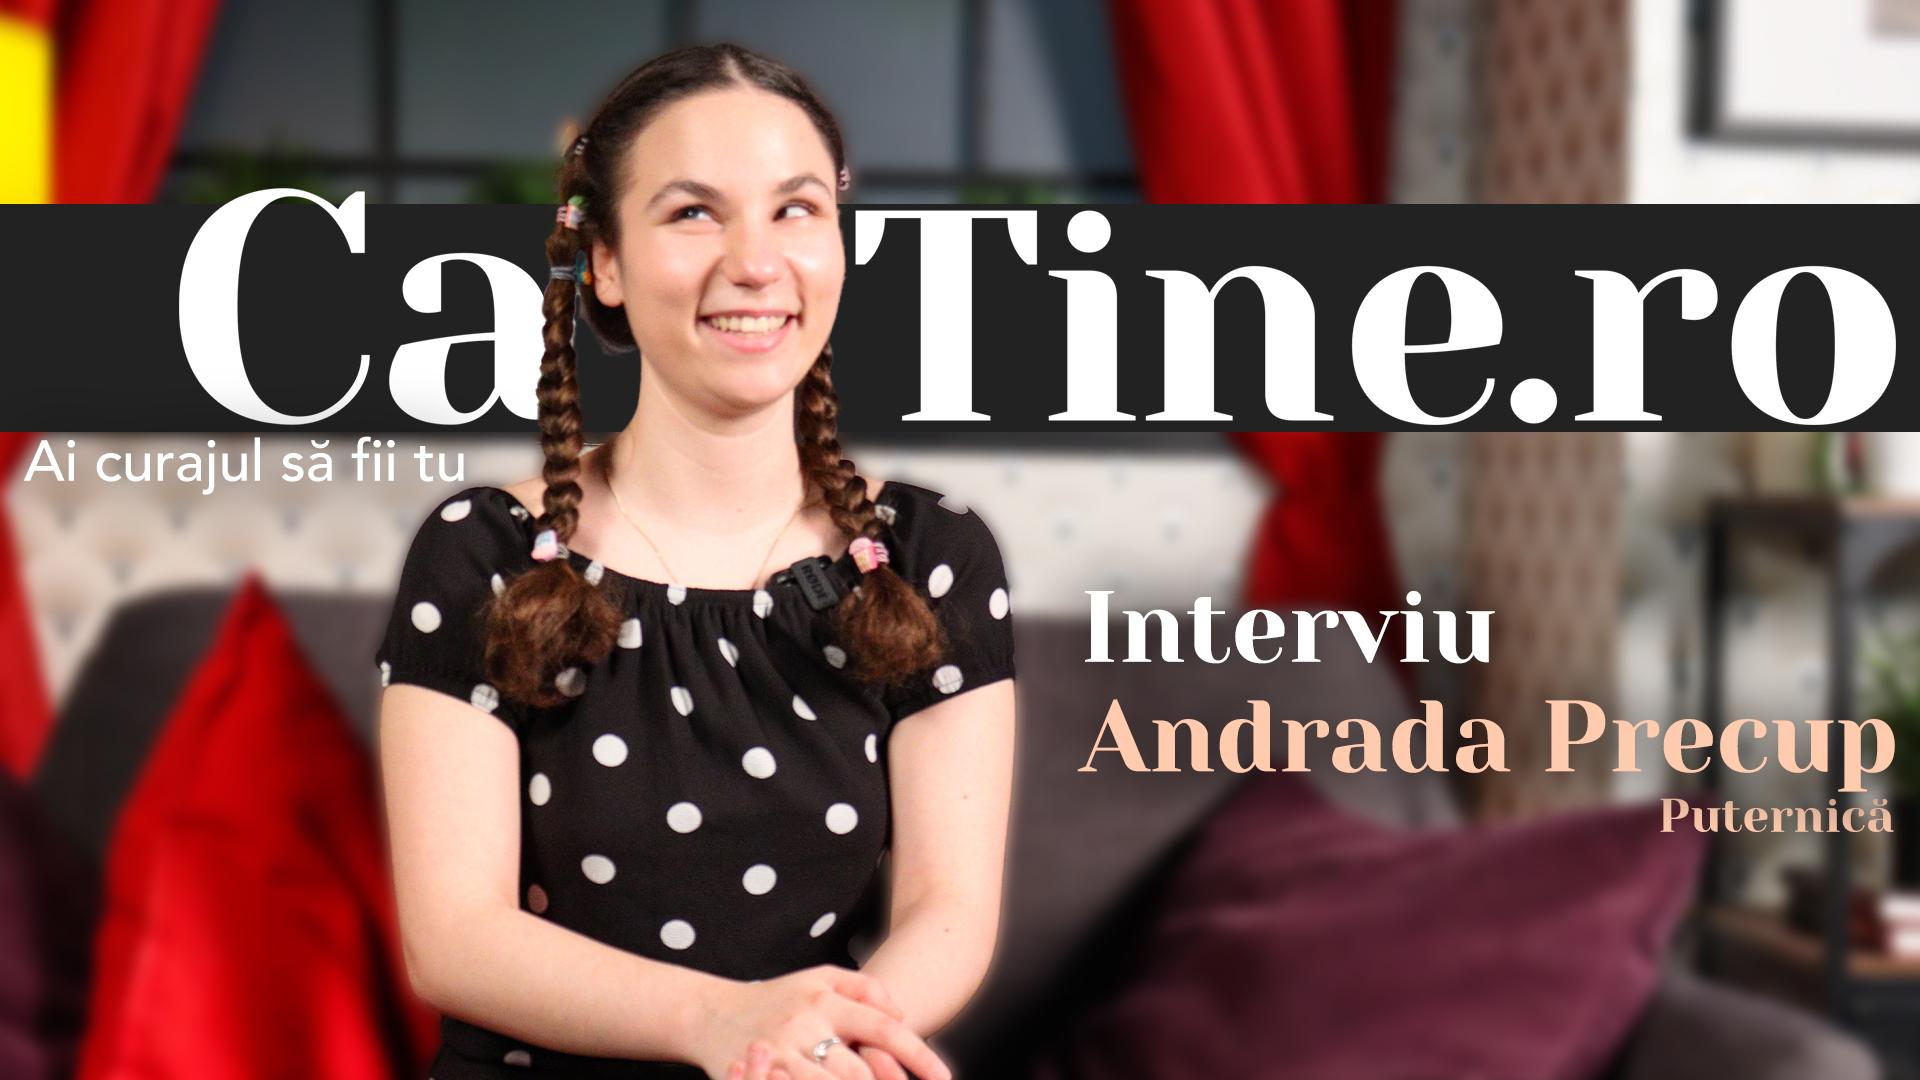 CaTine.Ro - Interviu Andrada Precup - Puternică